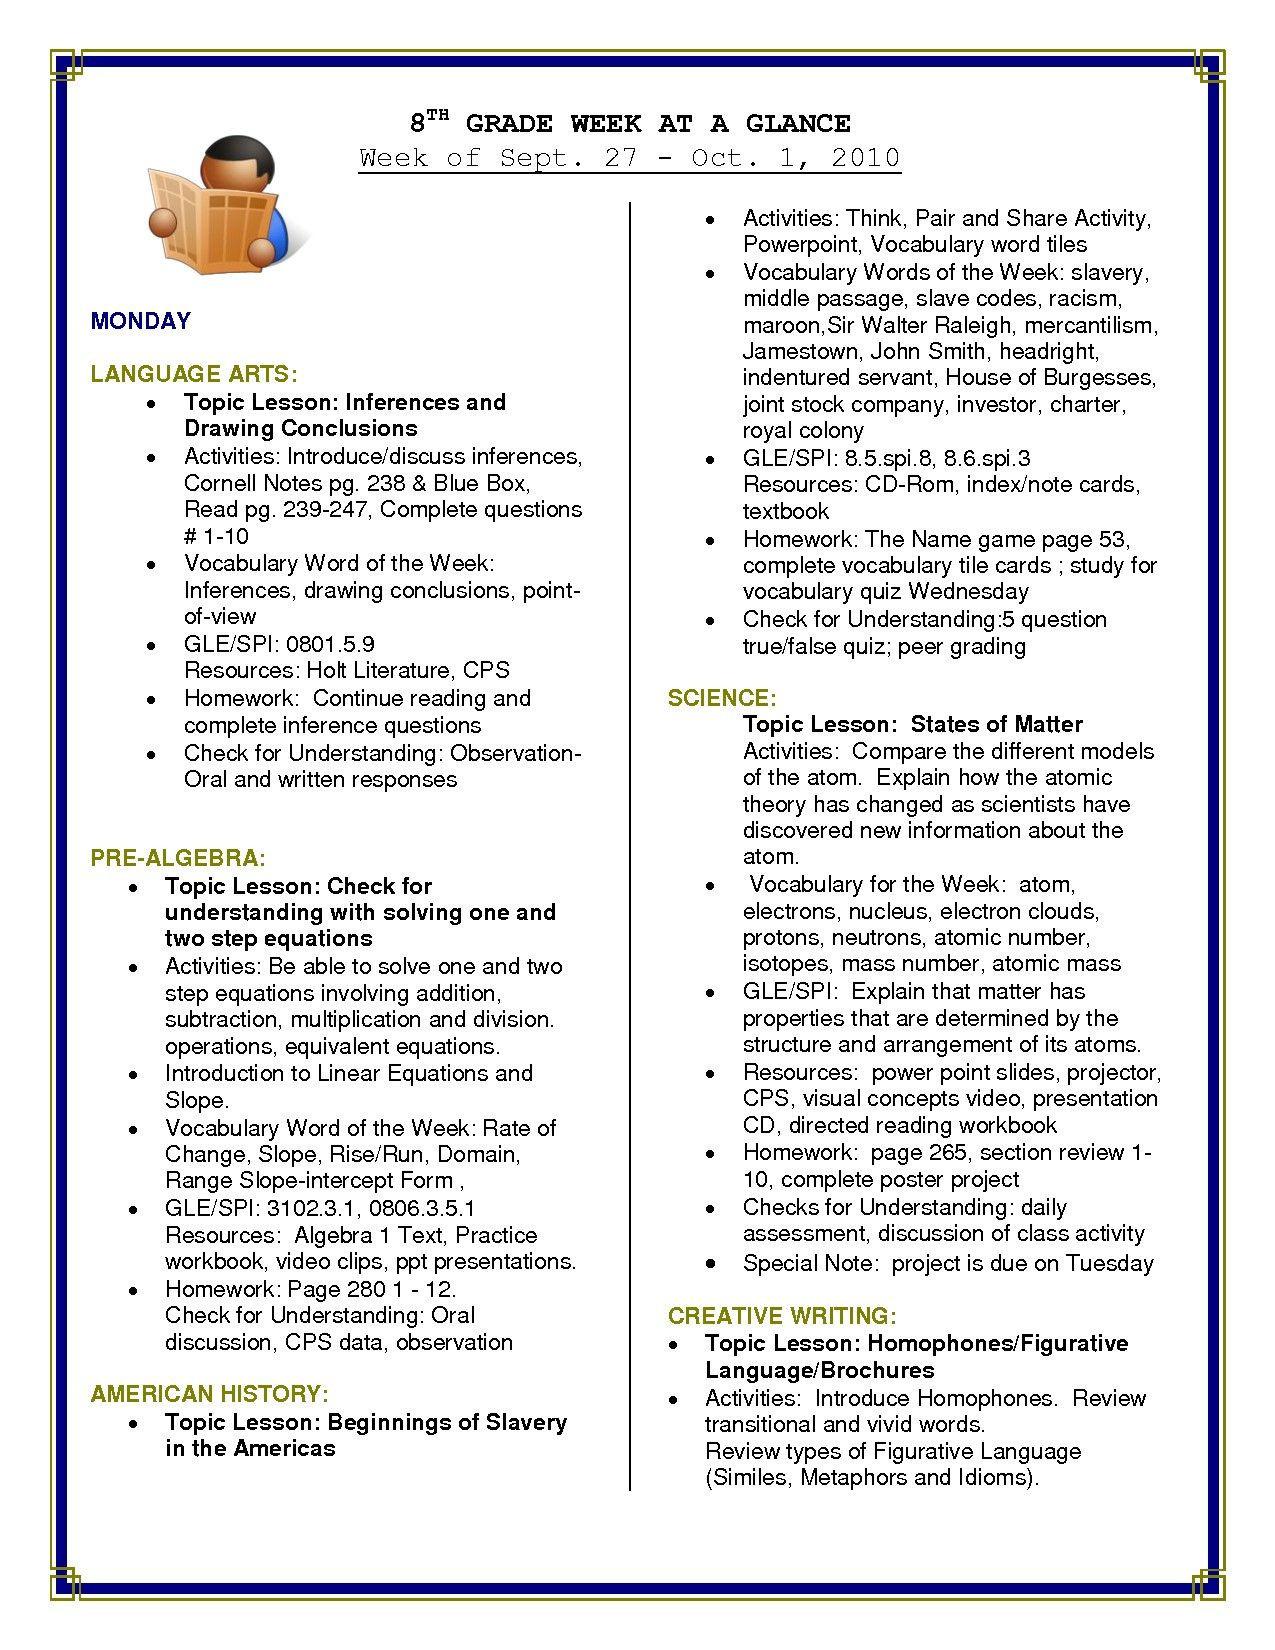 9th Grade Reading Comprehension Worksheet 8th Grade Reading Worksheets